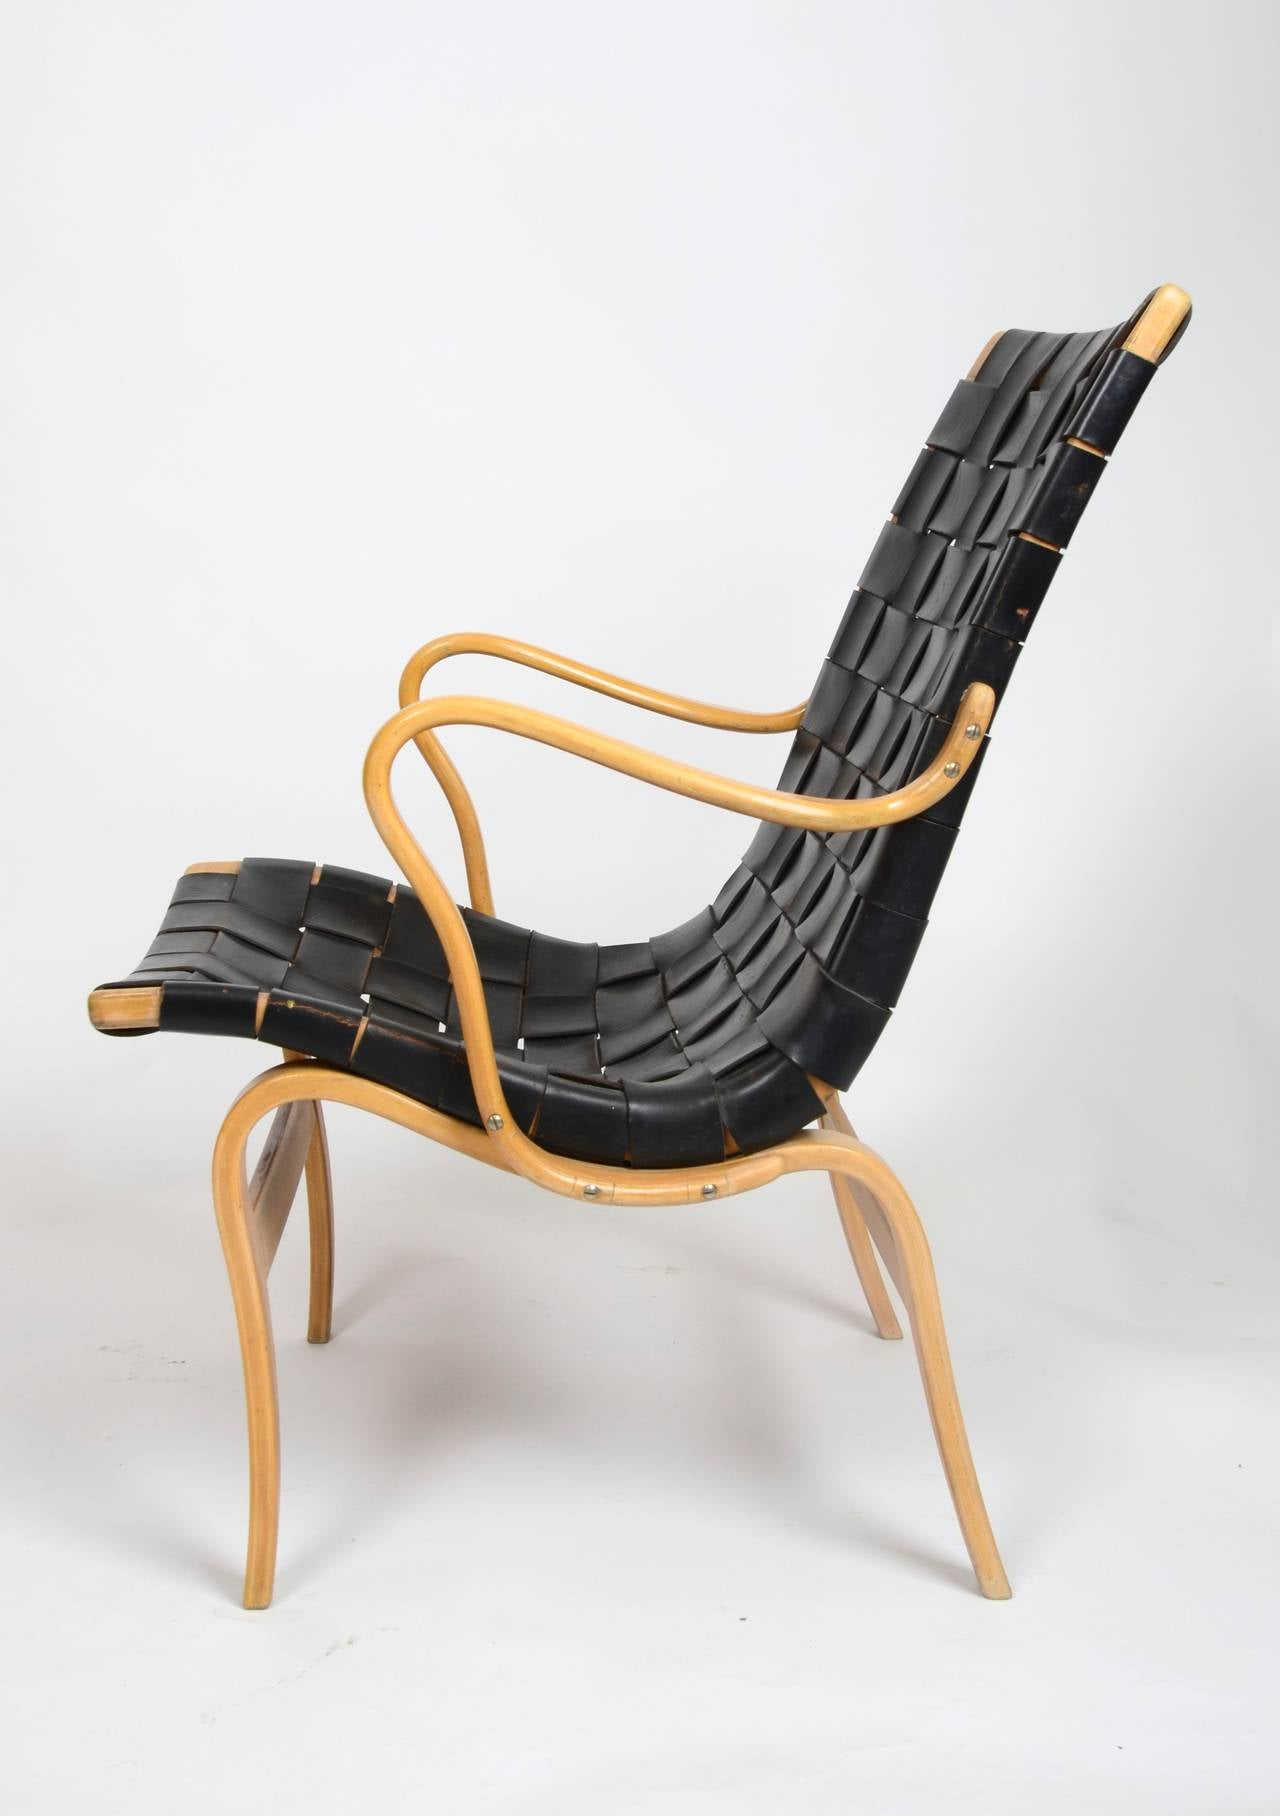 Scandinavian Modern Eva Chair In Leather by Bruno Mathsson for Karl Mathsson, Sweden For Sale